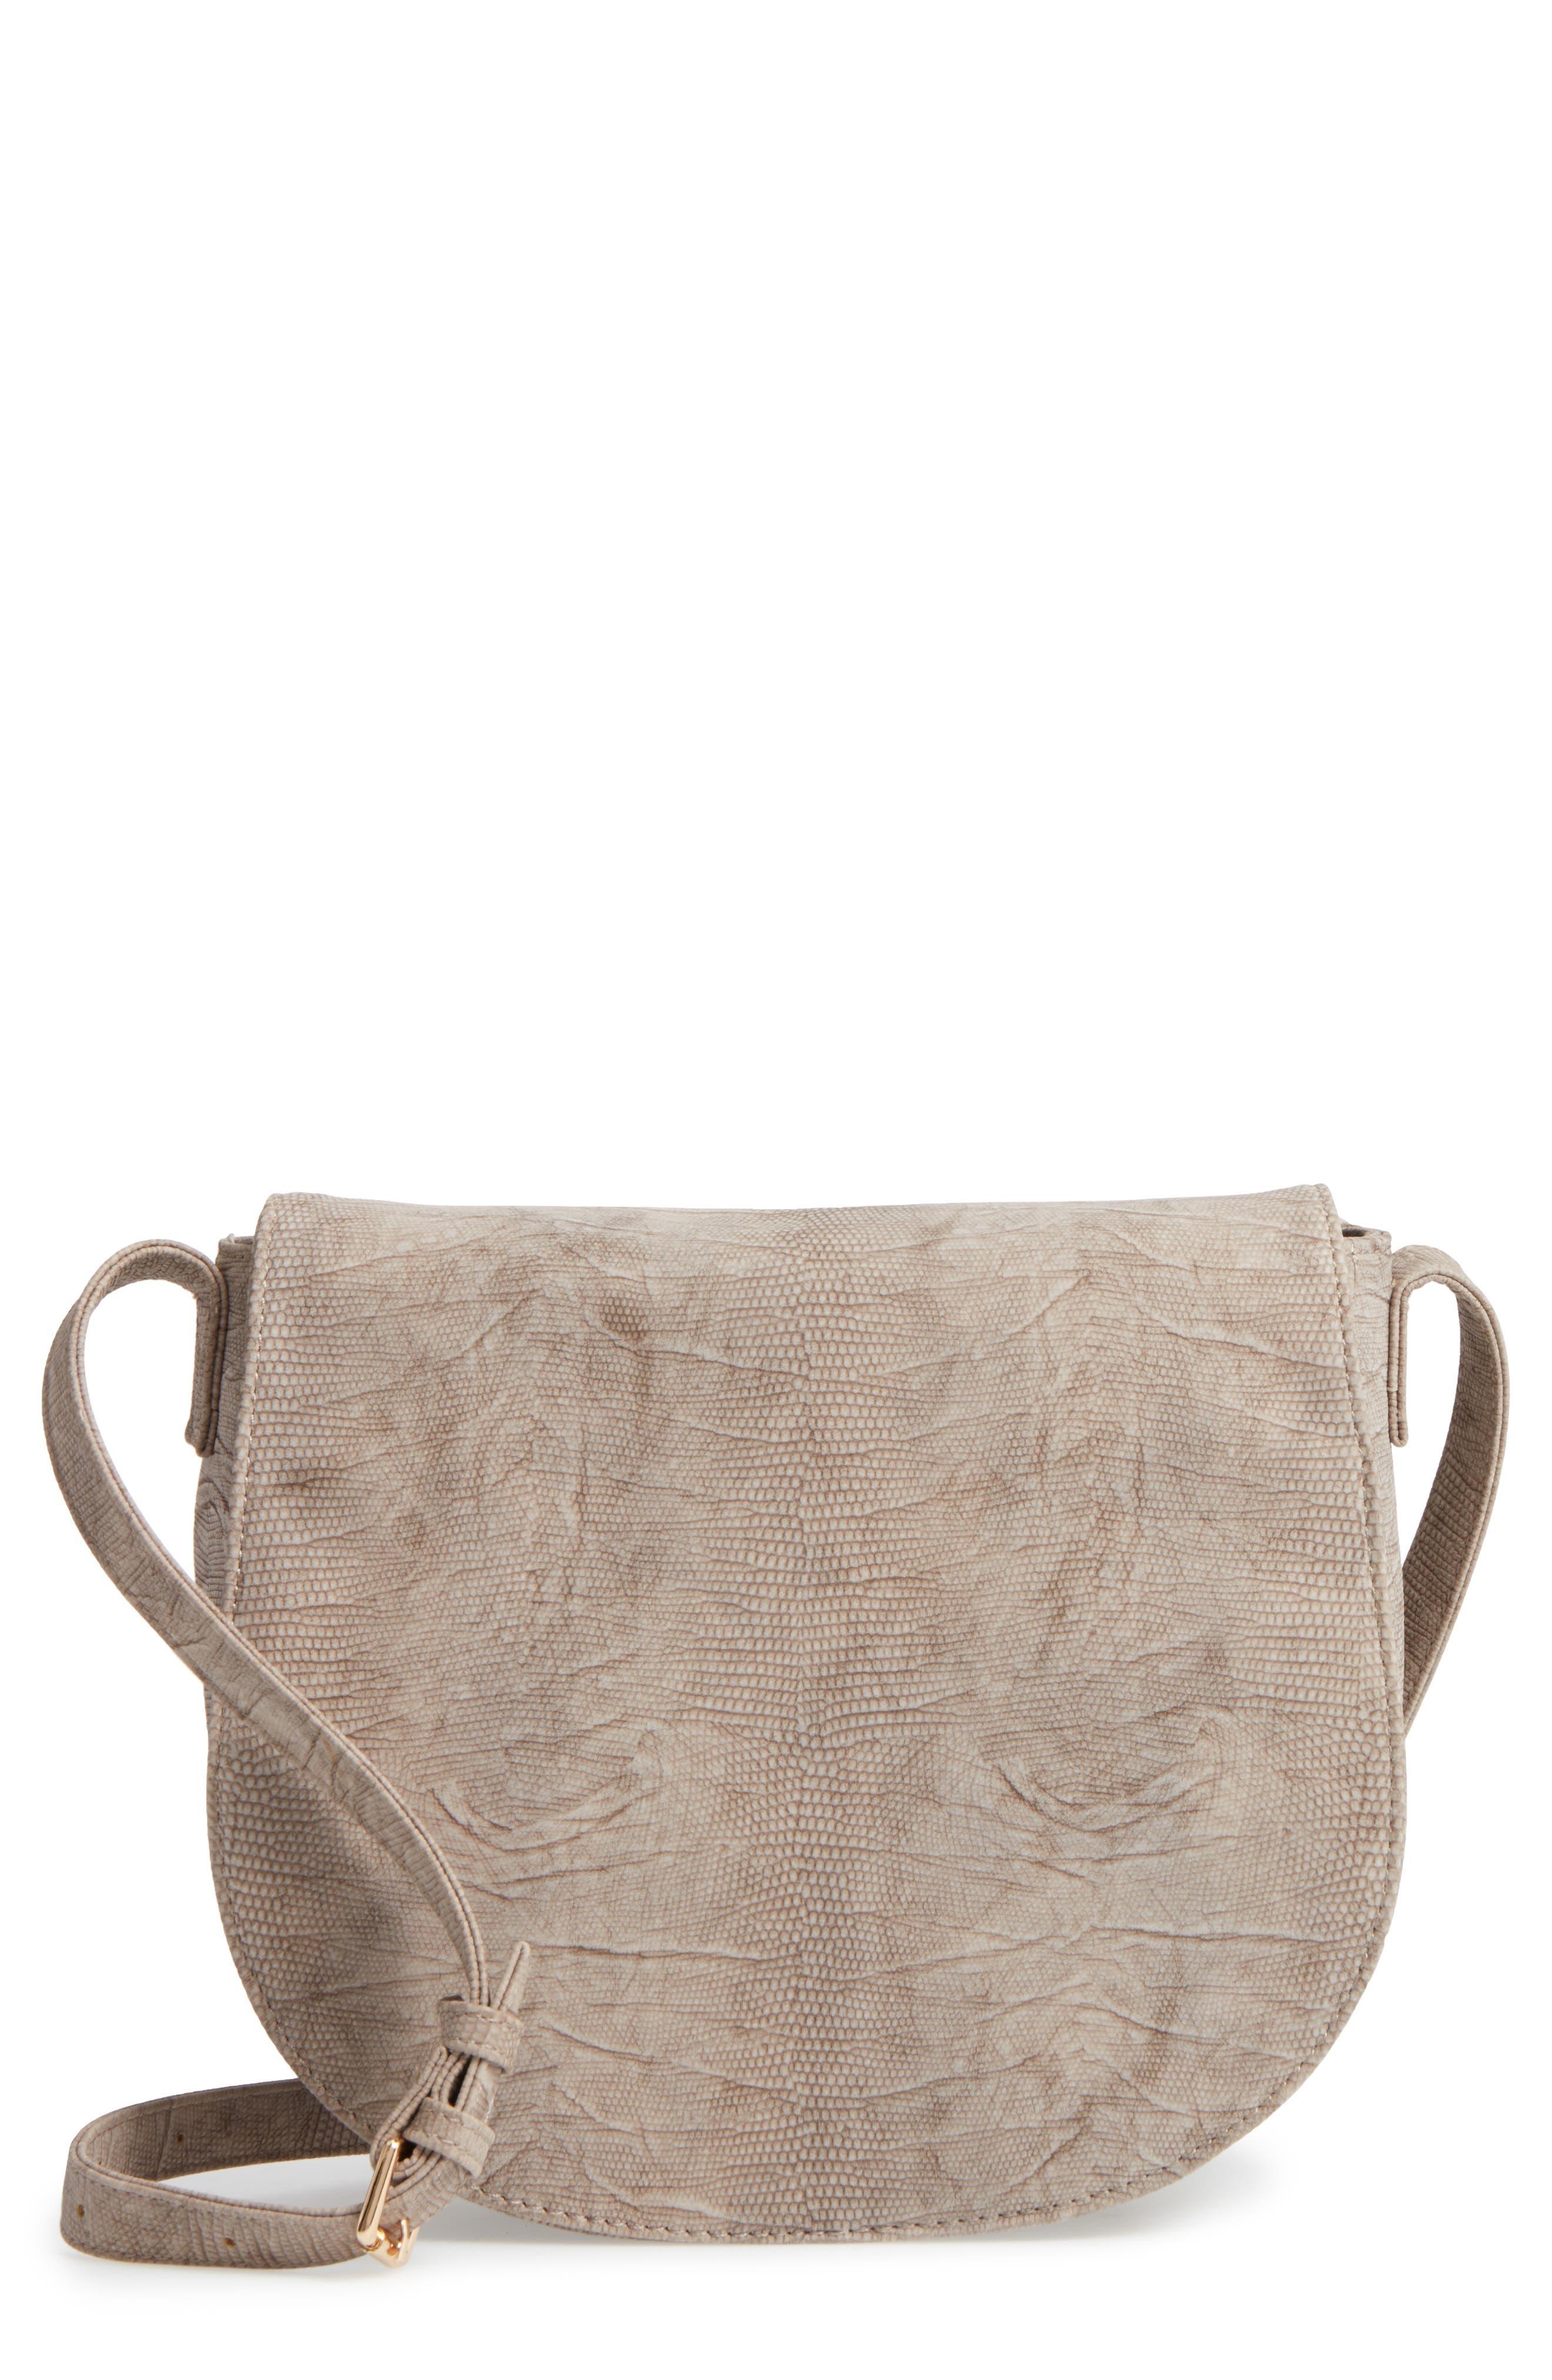 Livvy Faux Leather Crossbody Saddle Bag,                             Main thumbnail 1, color,                             250